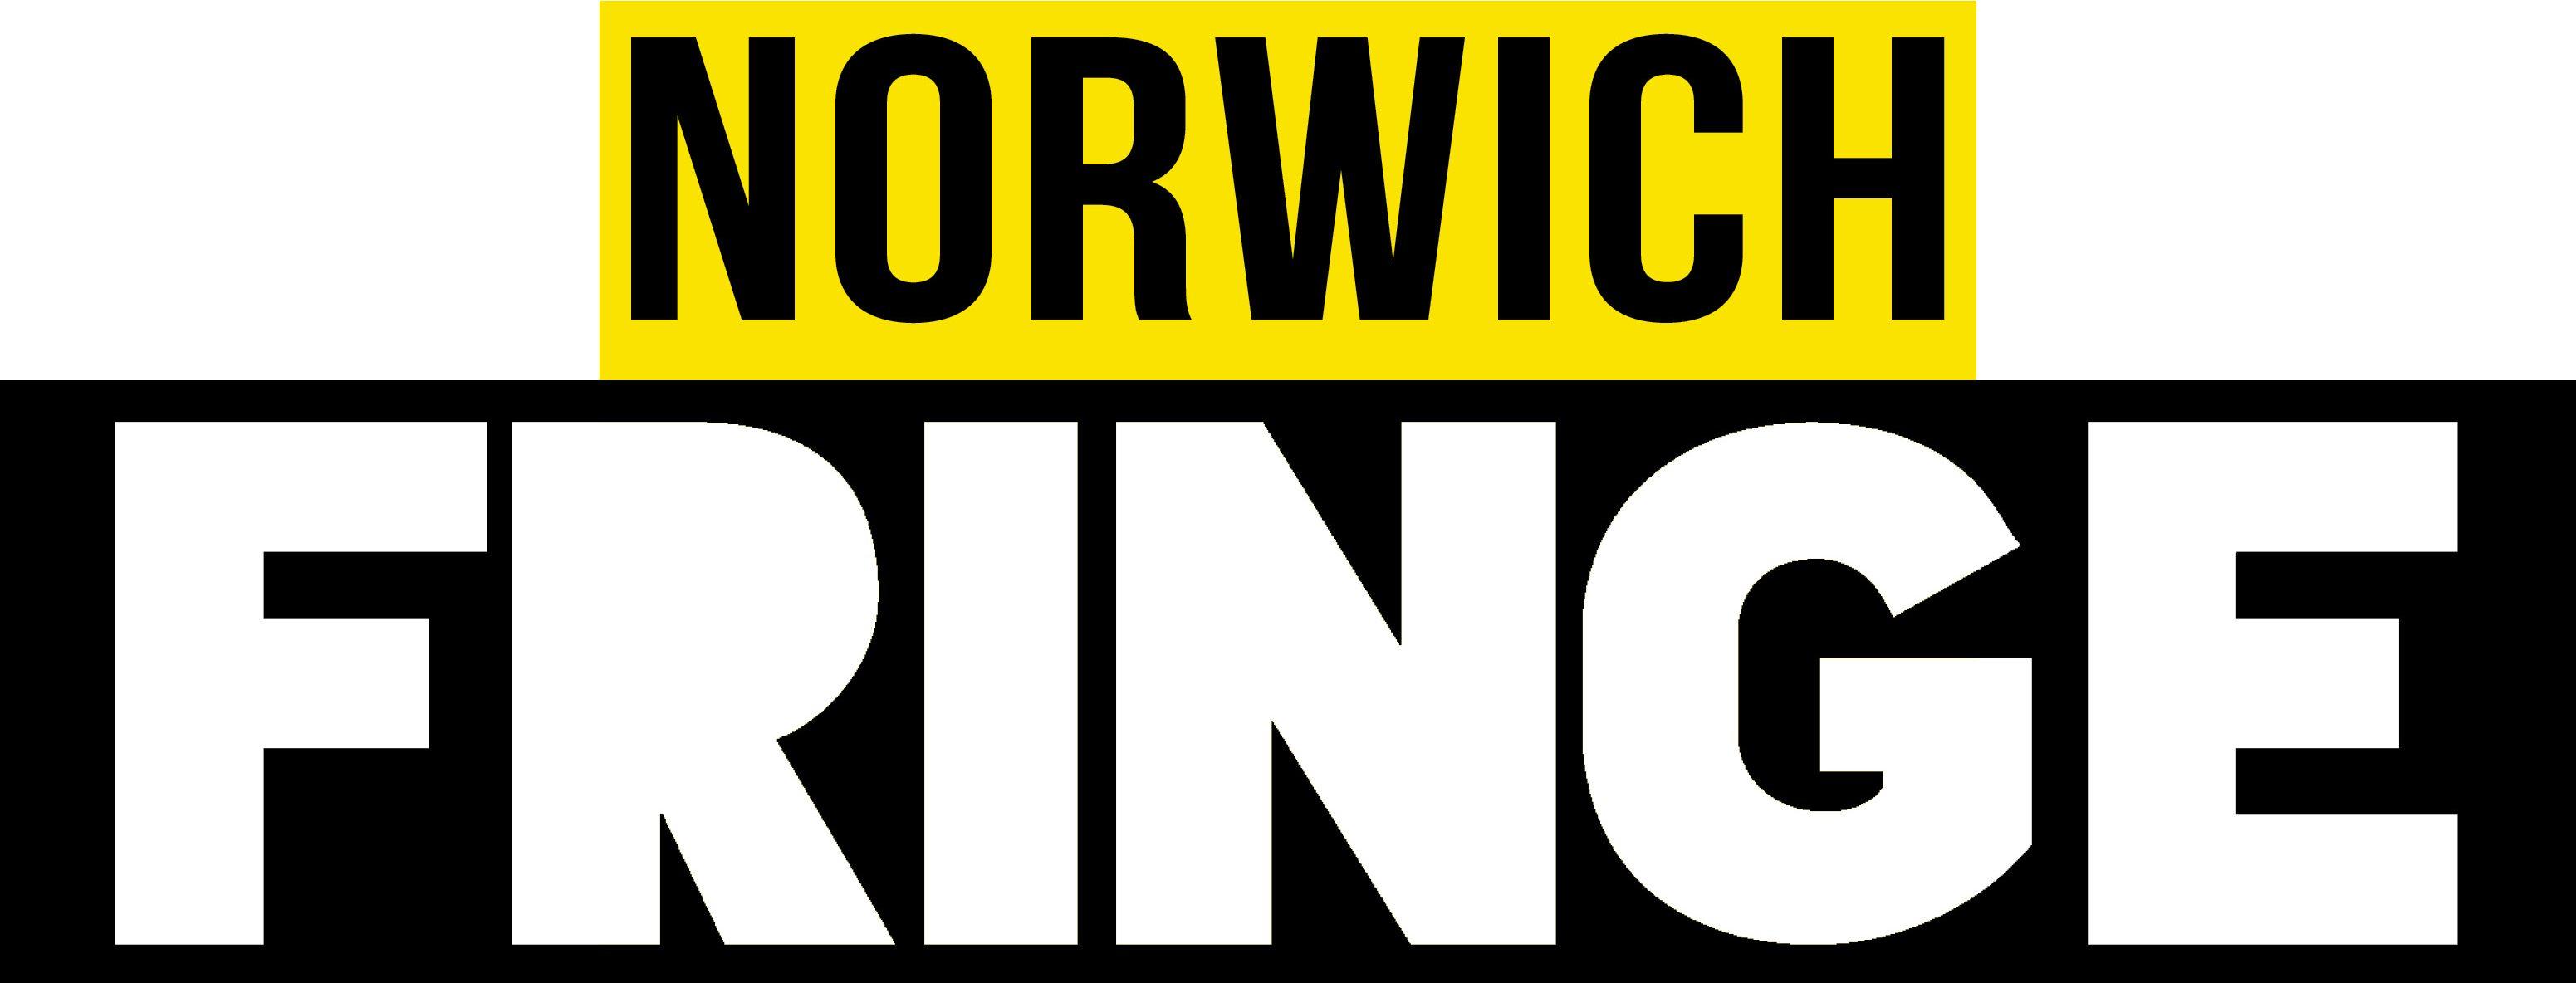 Norwich Fringe